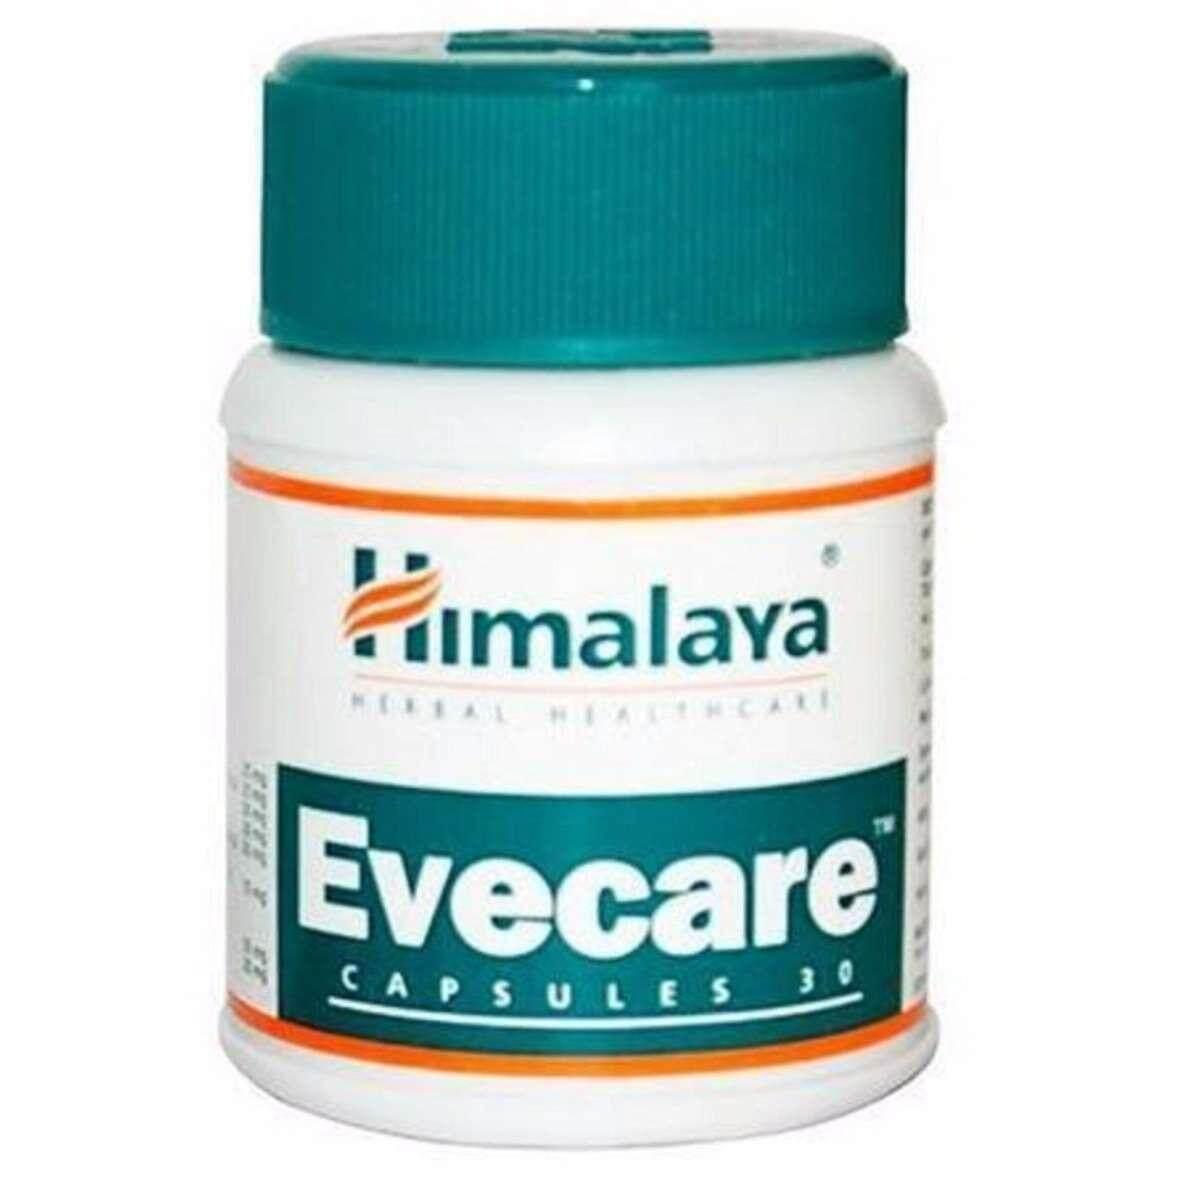 Himalaya Healthcare Evecare tablet-60s (Fertility, Irregular Menstrual, Uterine Care)